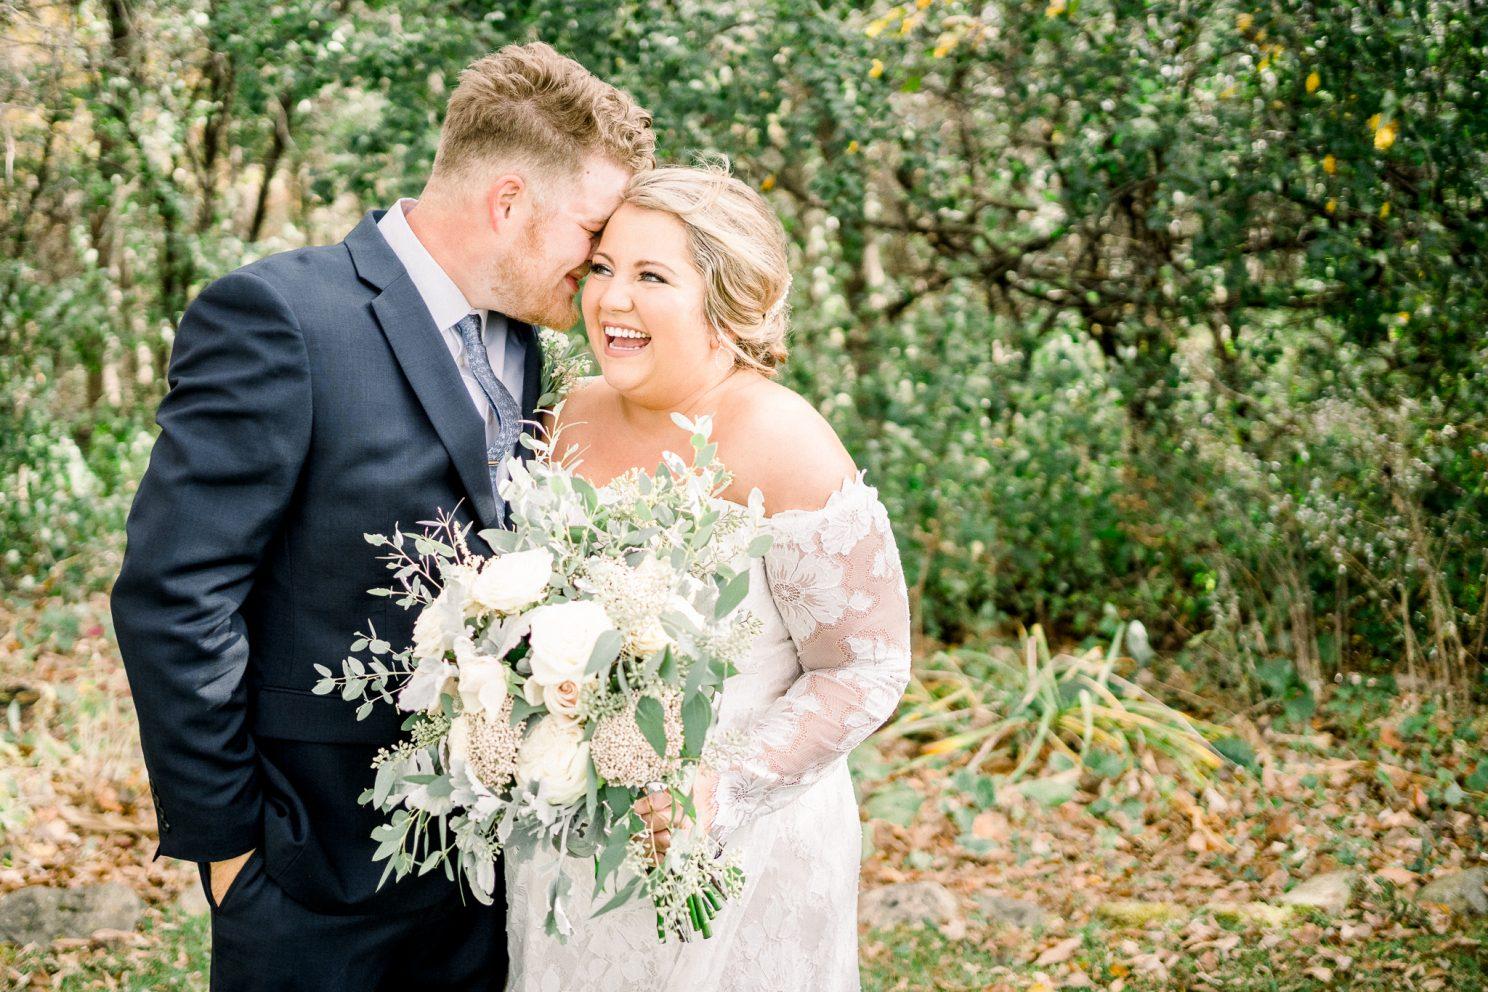 Ben Brooke Fine Art Wedding Photography Prescott WI 2020112